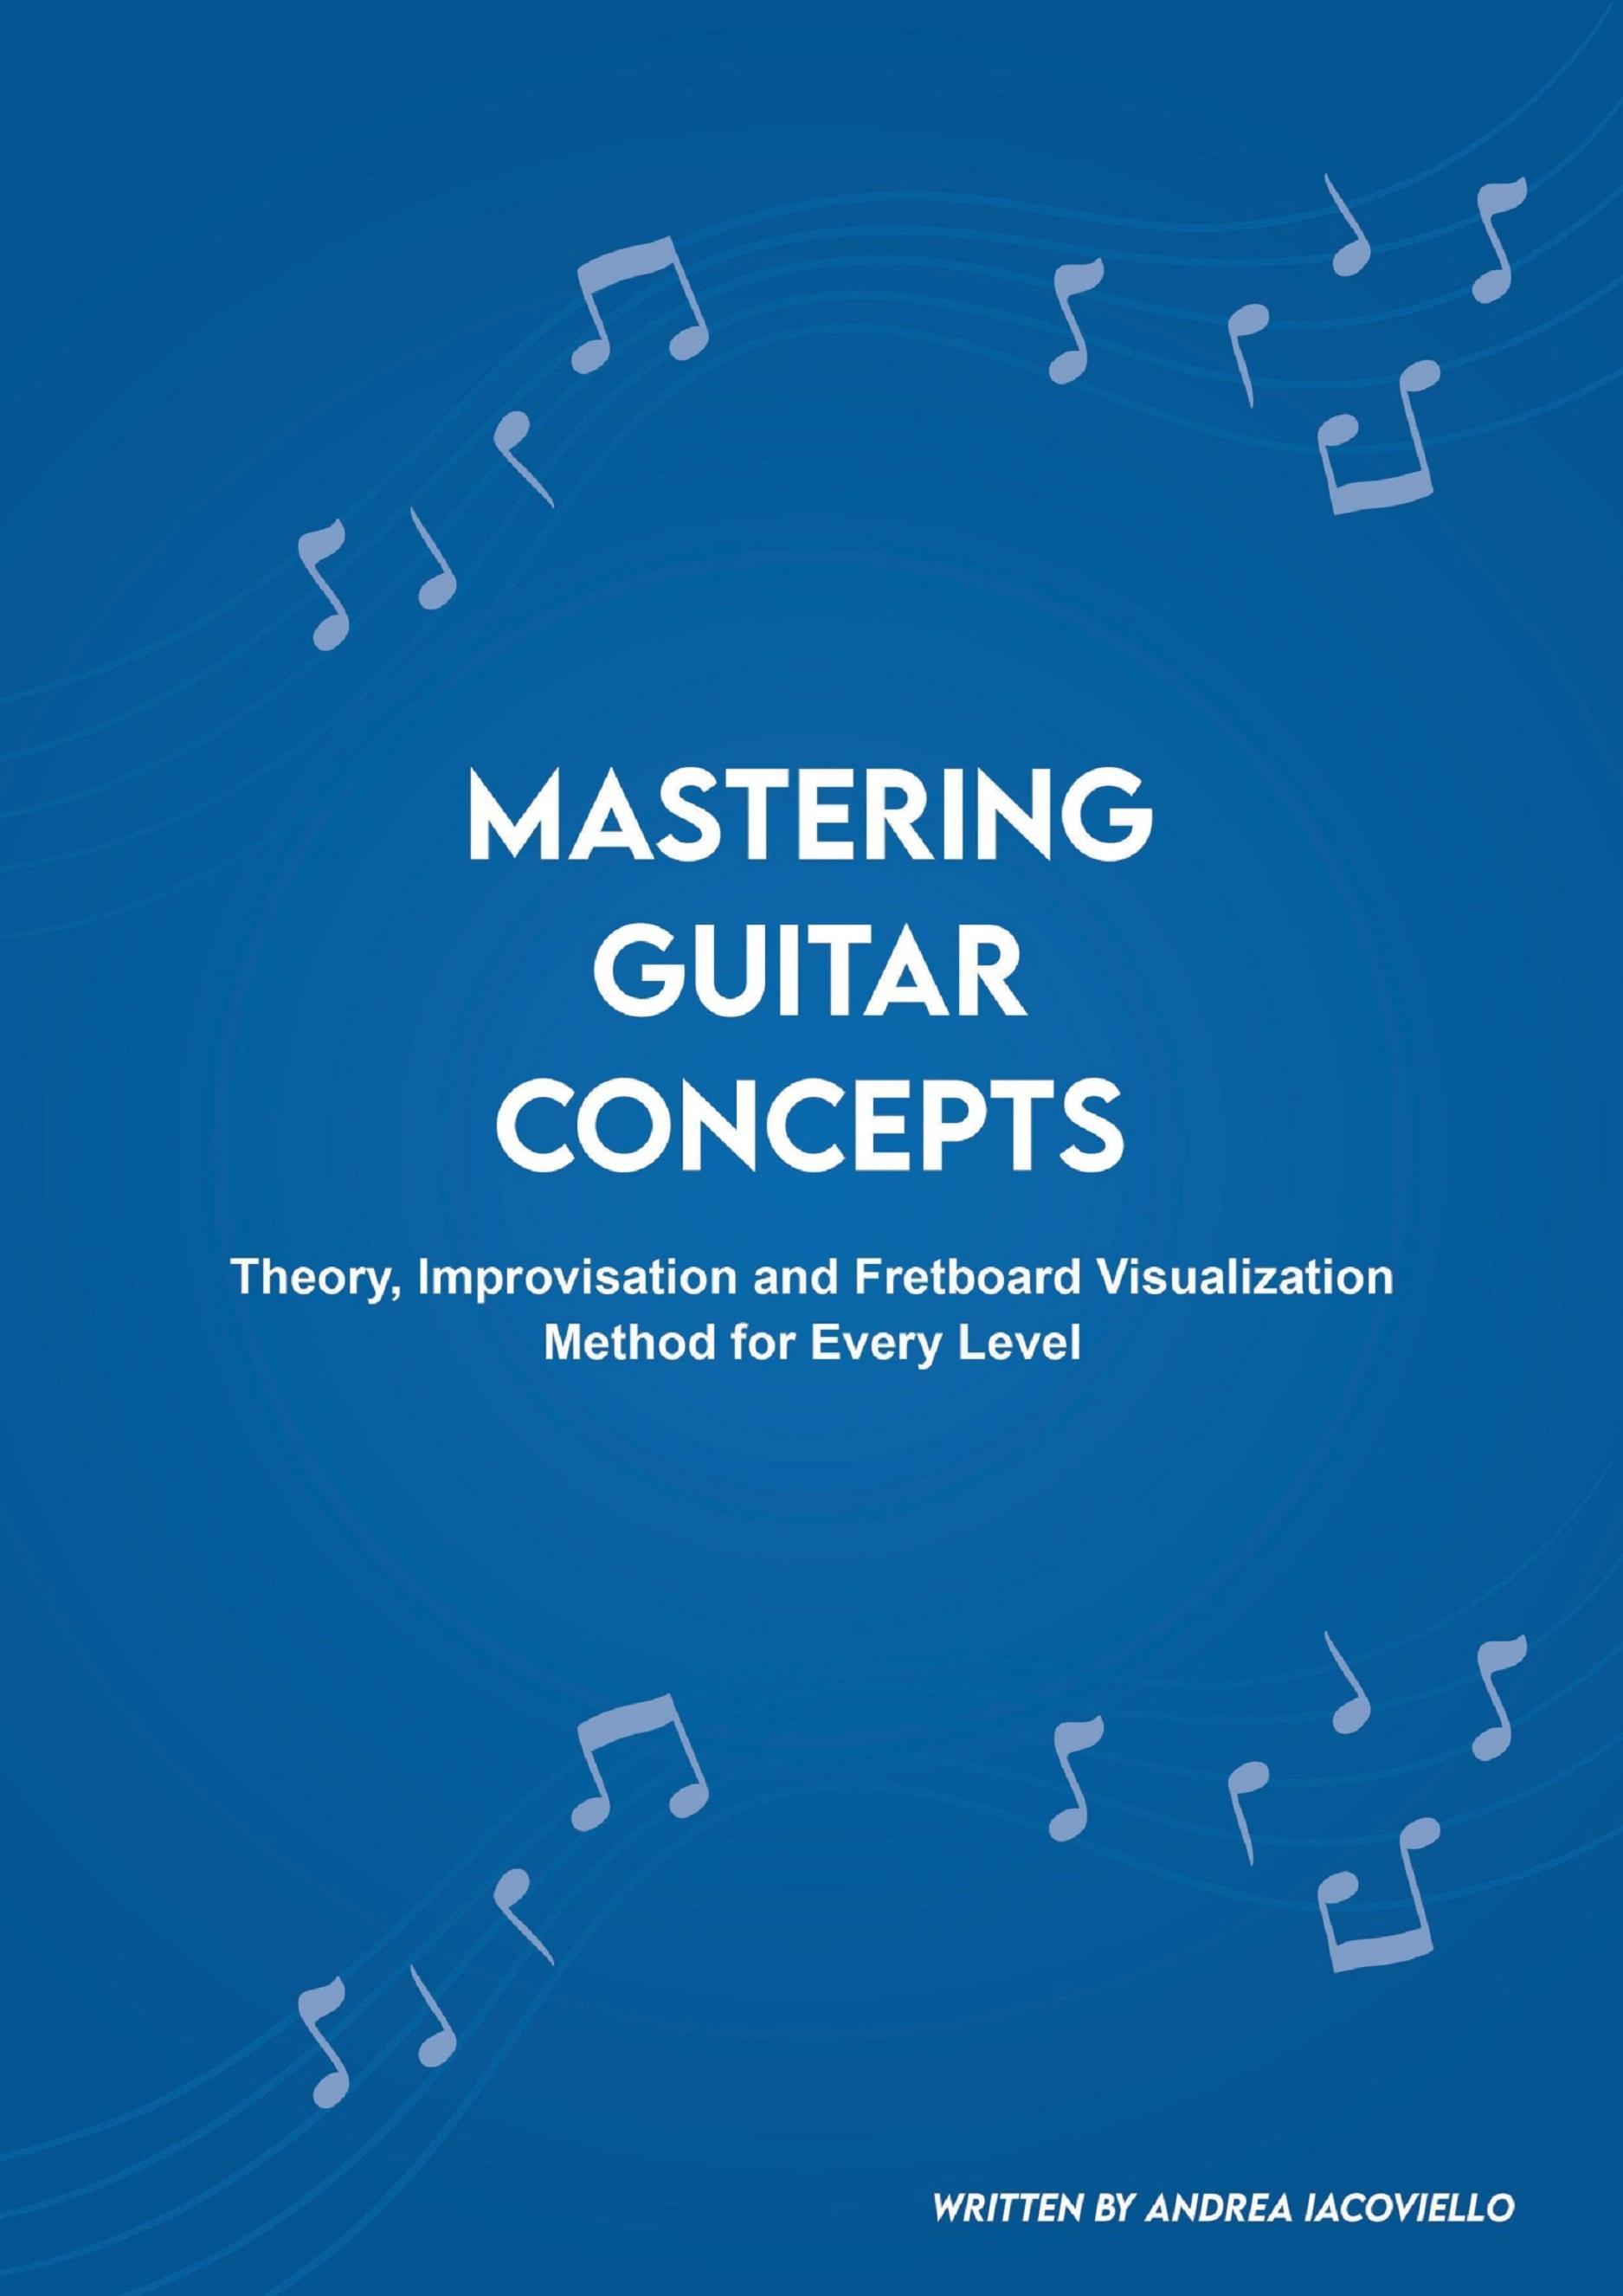 Mastering Guitar Concepts